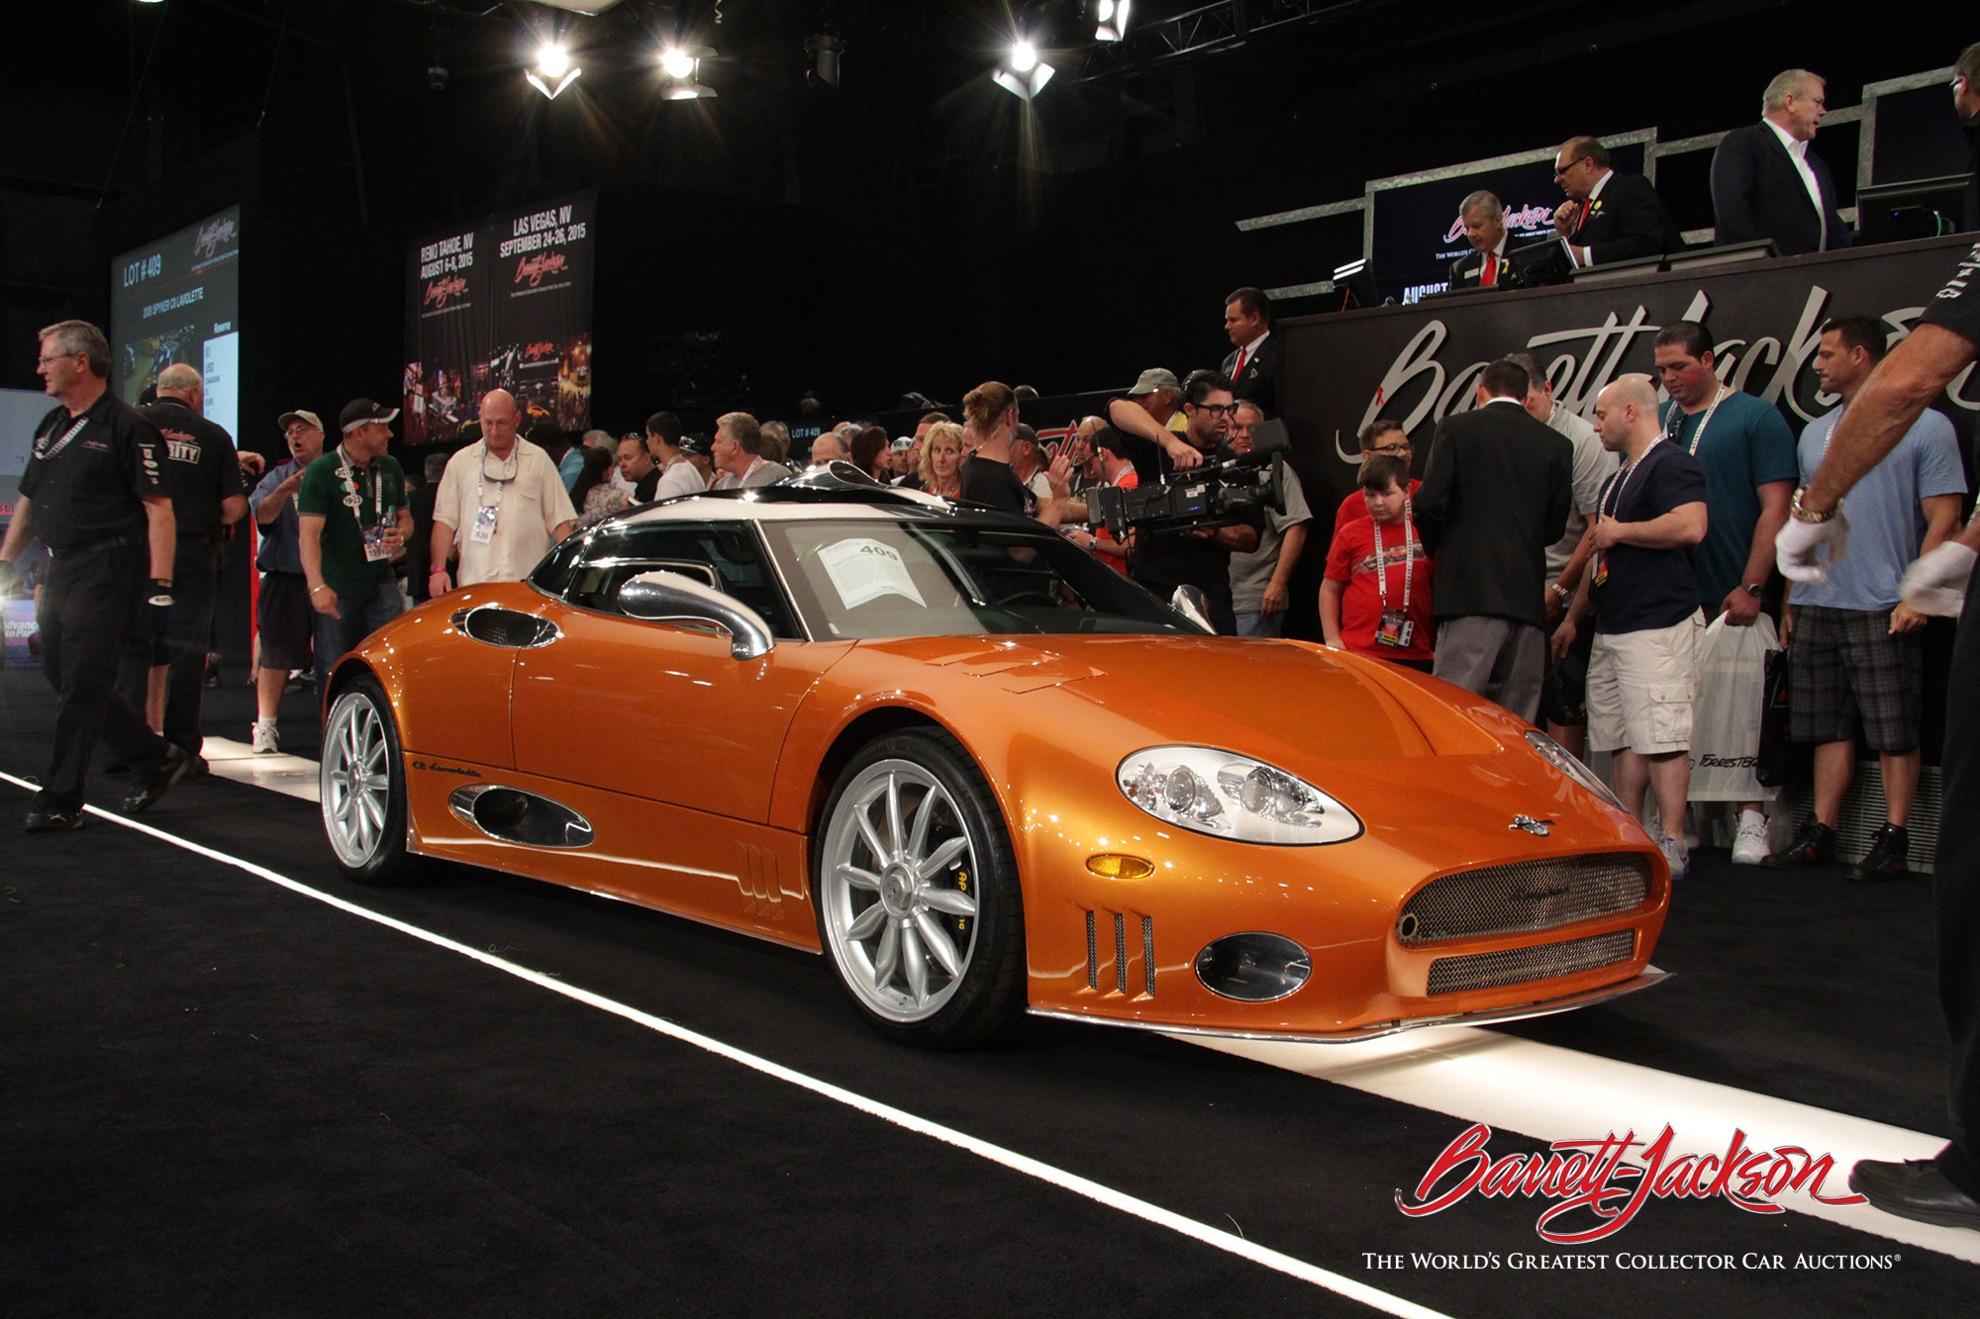 Lot #409 – 2009 Spyker C8 Laviolette – $220,000